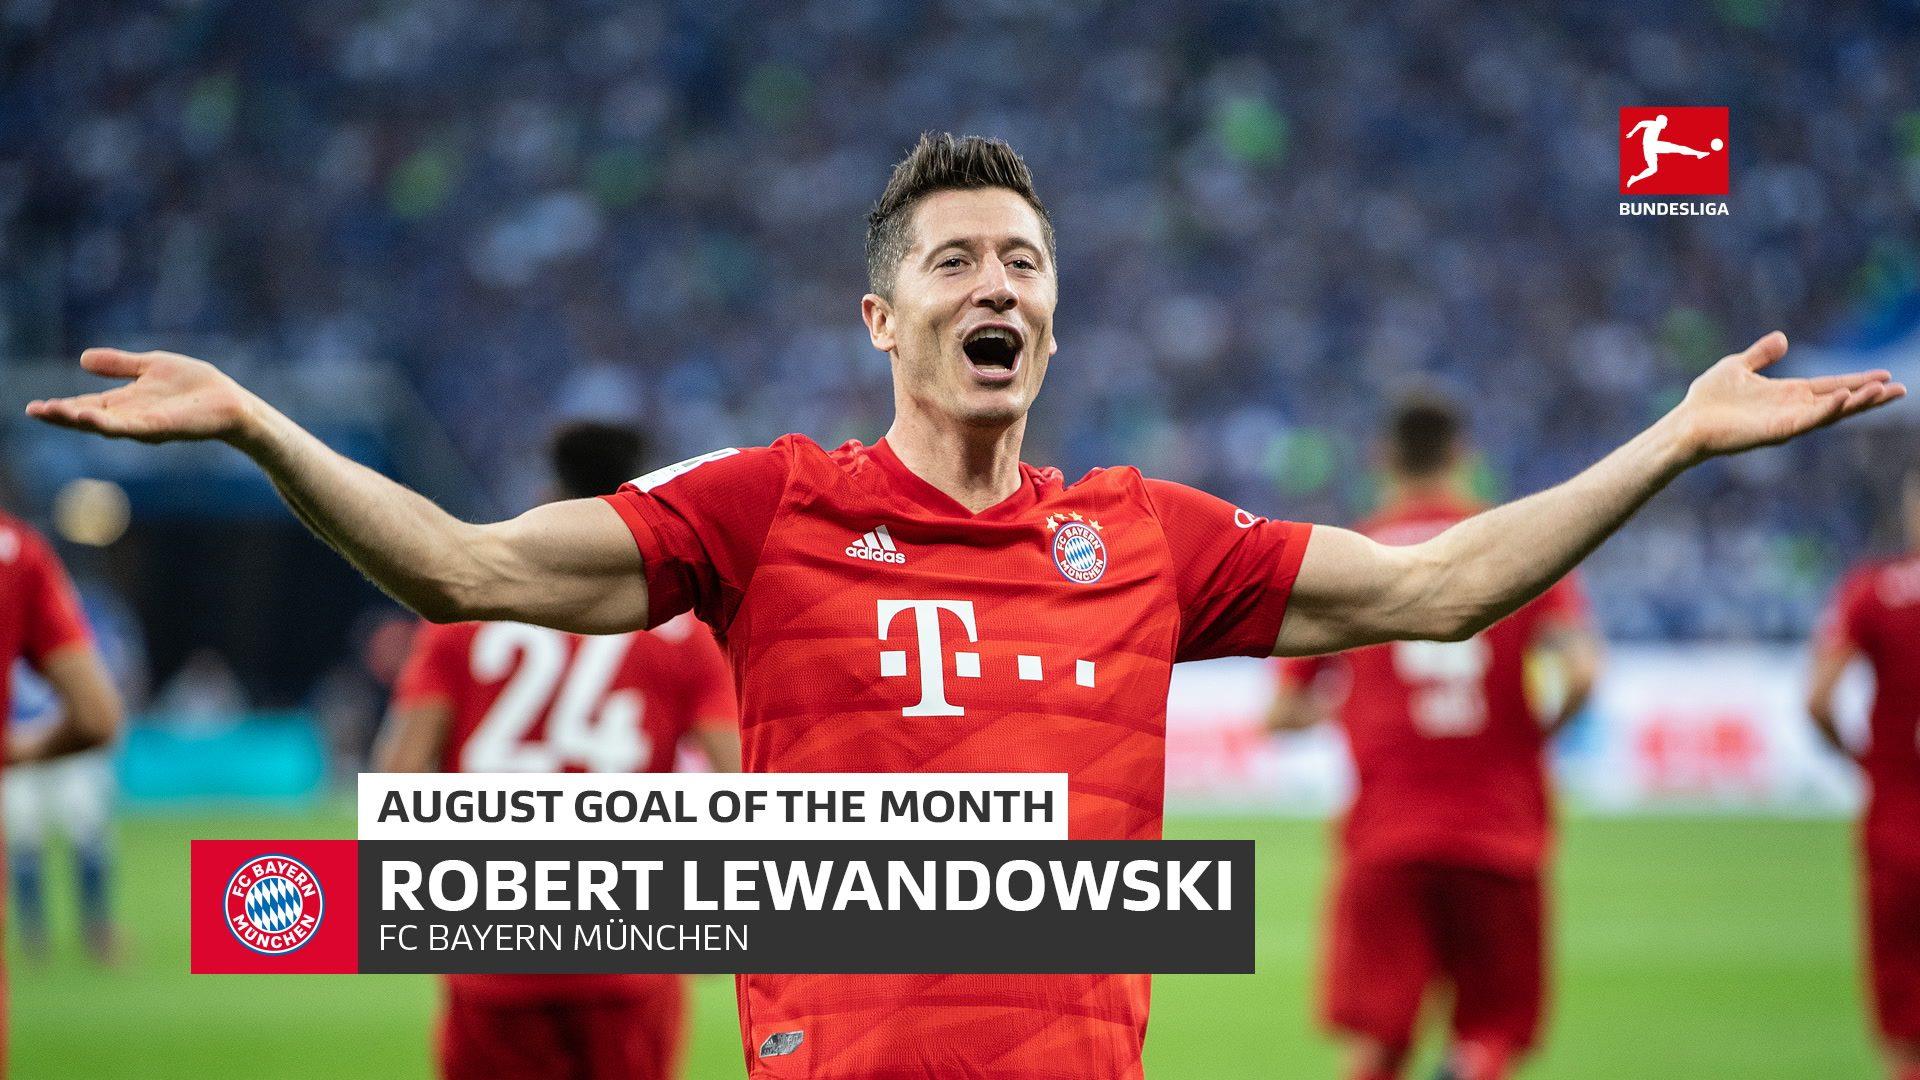 Bayern's Lewandowski wins August Goal of the Month!